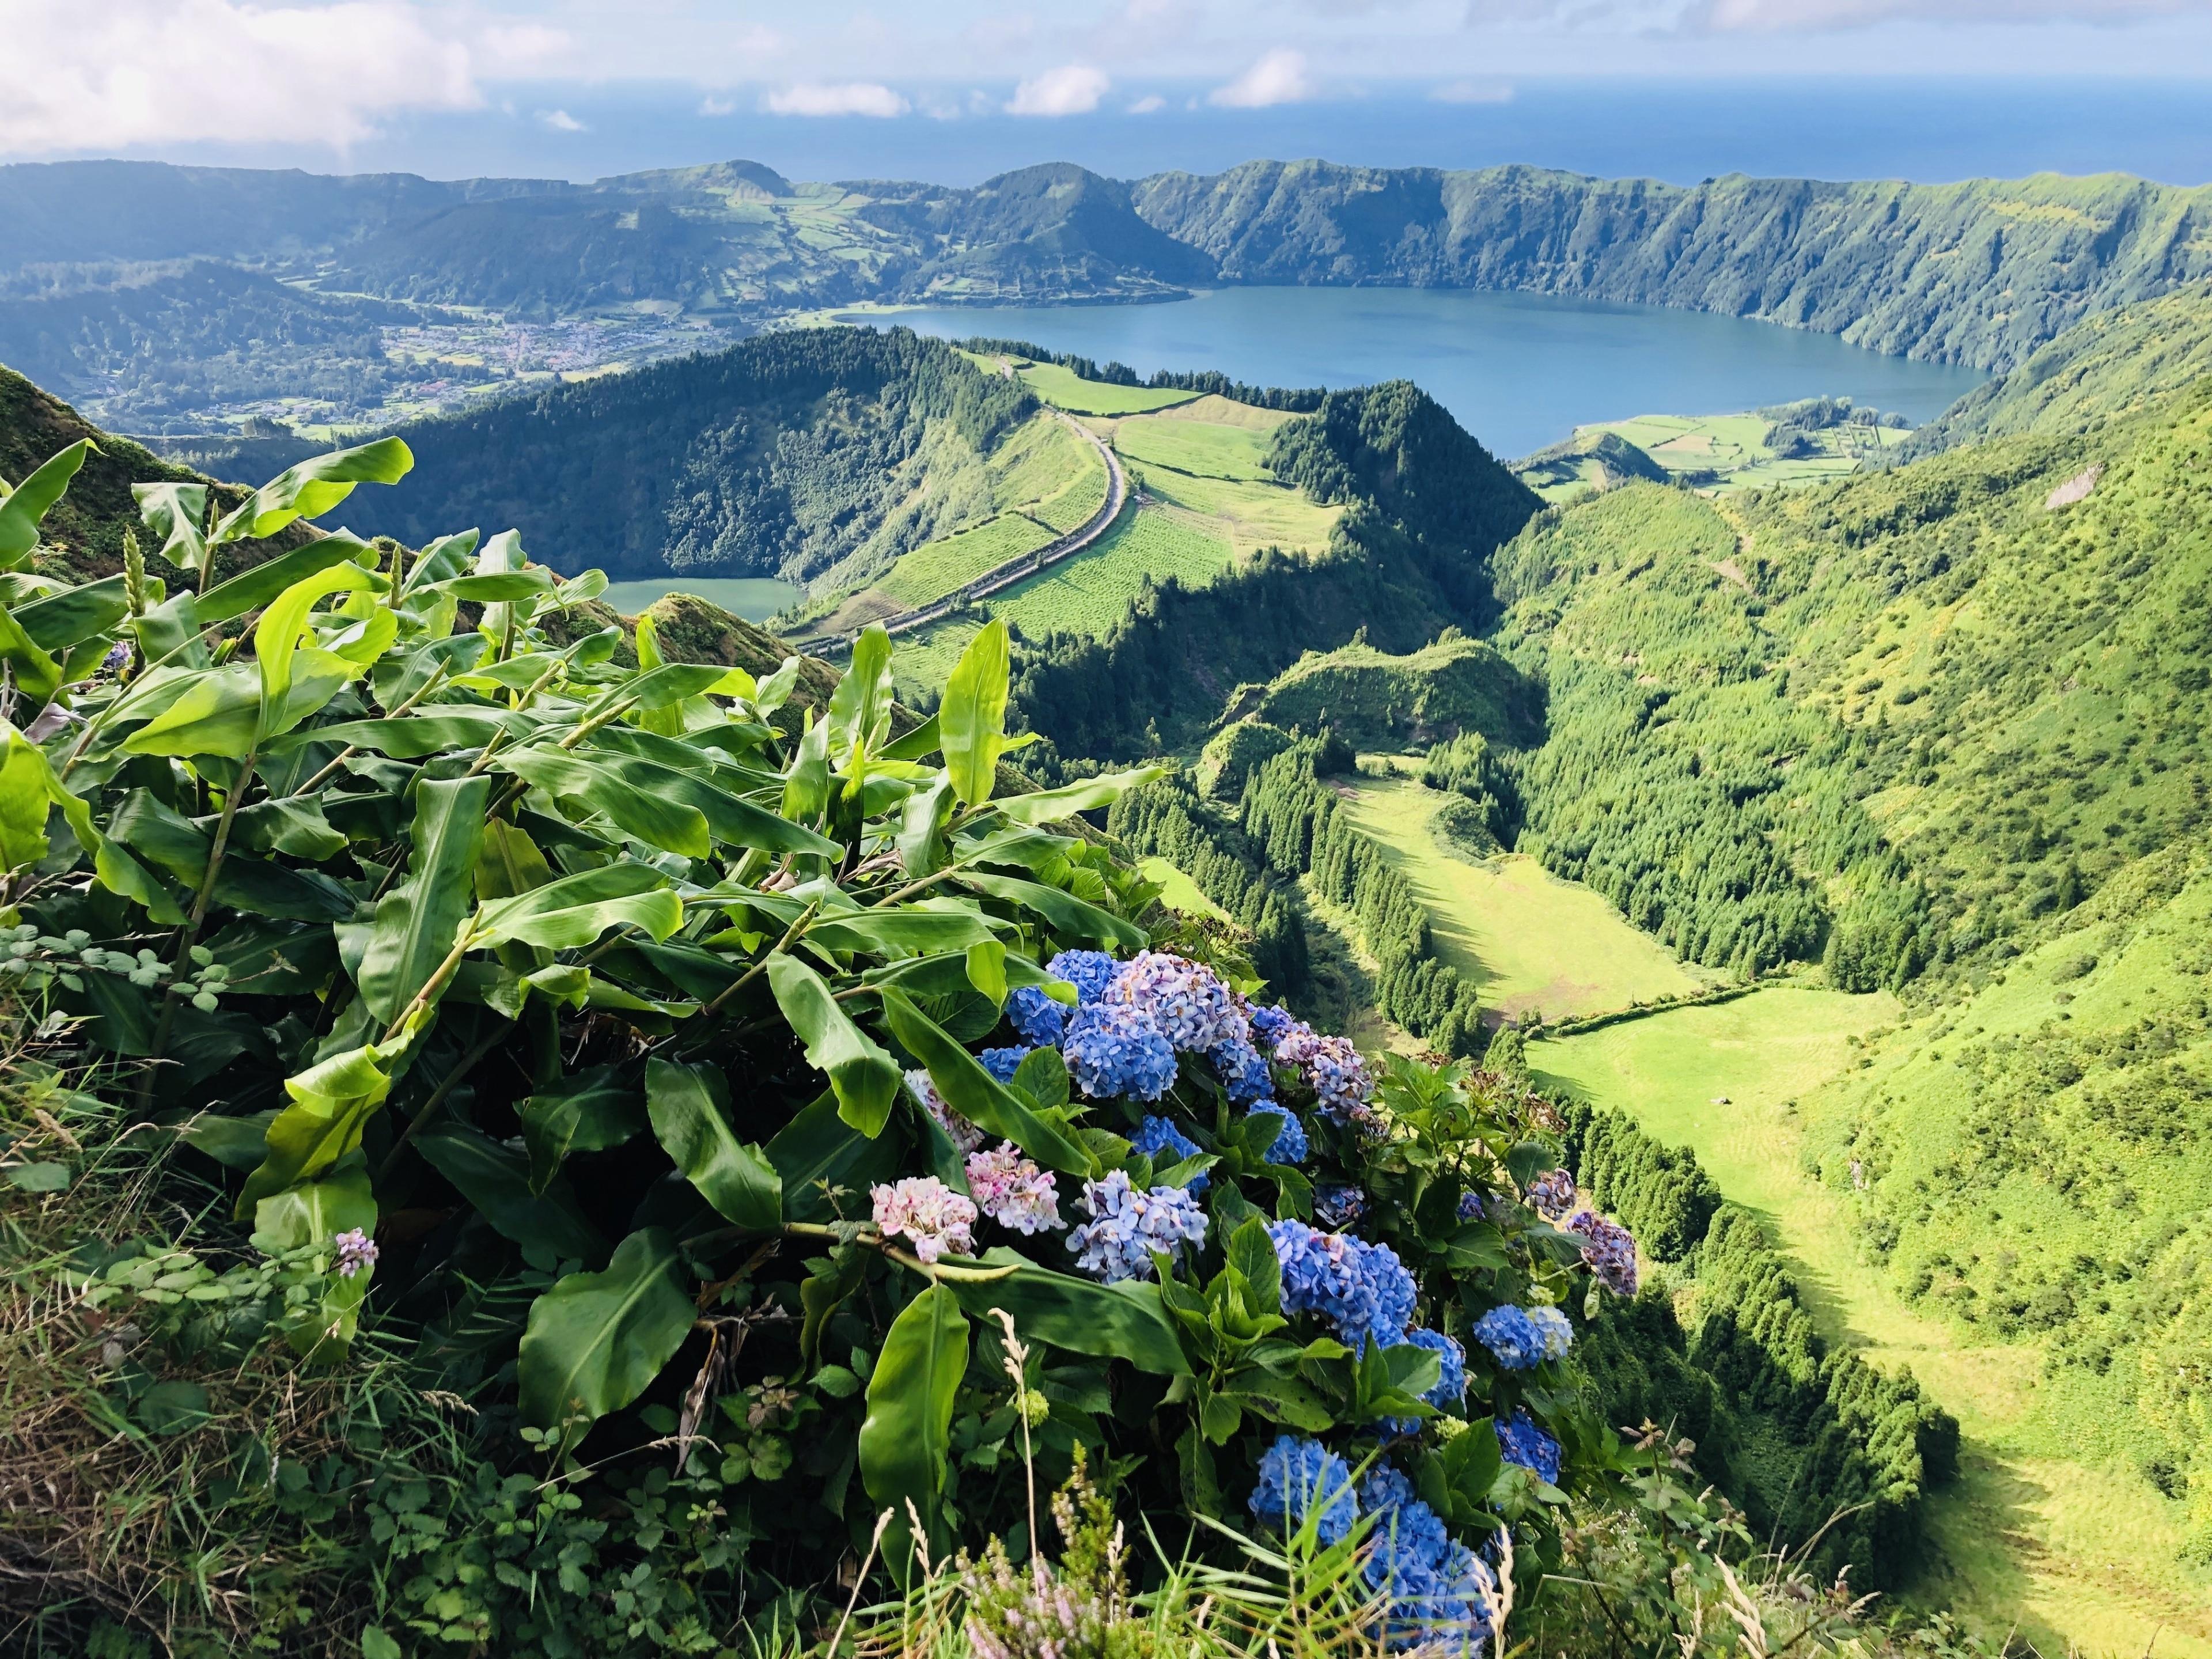 Aussichtspunkt Boca do Inferno, Ponta Delgada, Azoren, Portugal